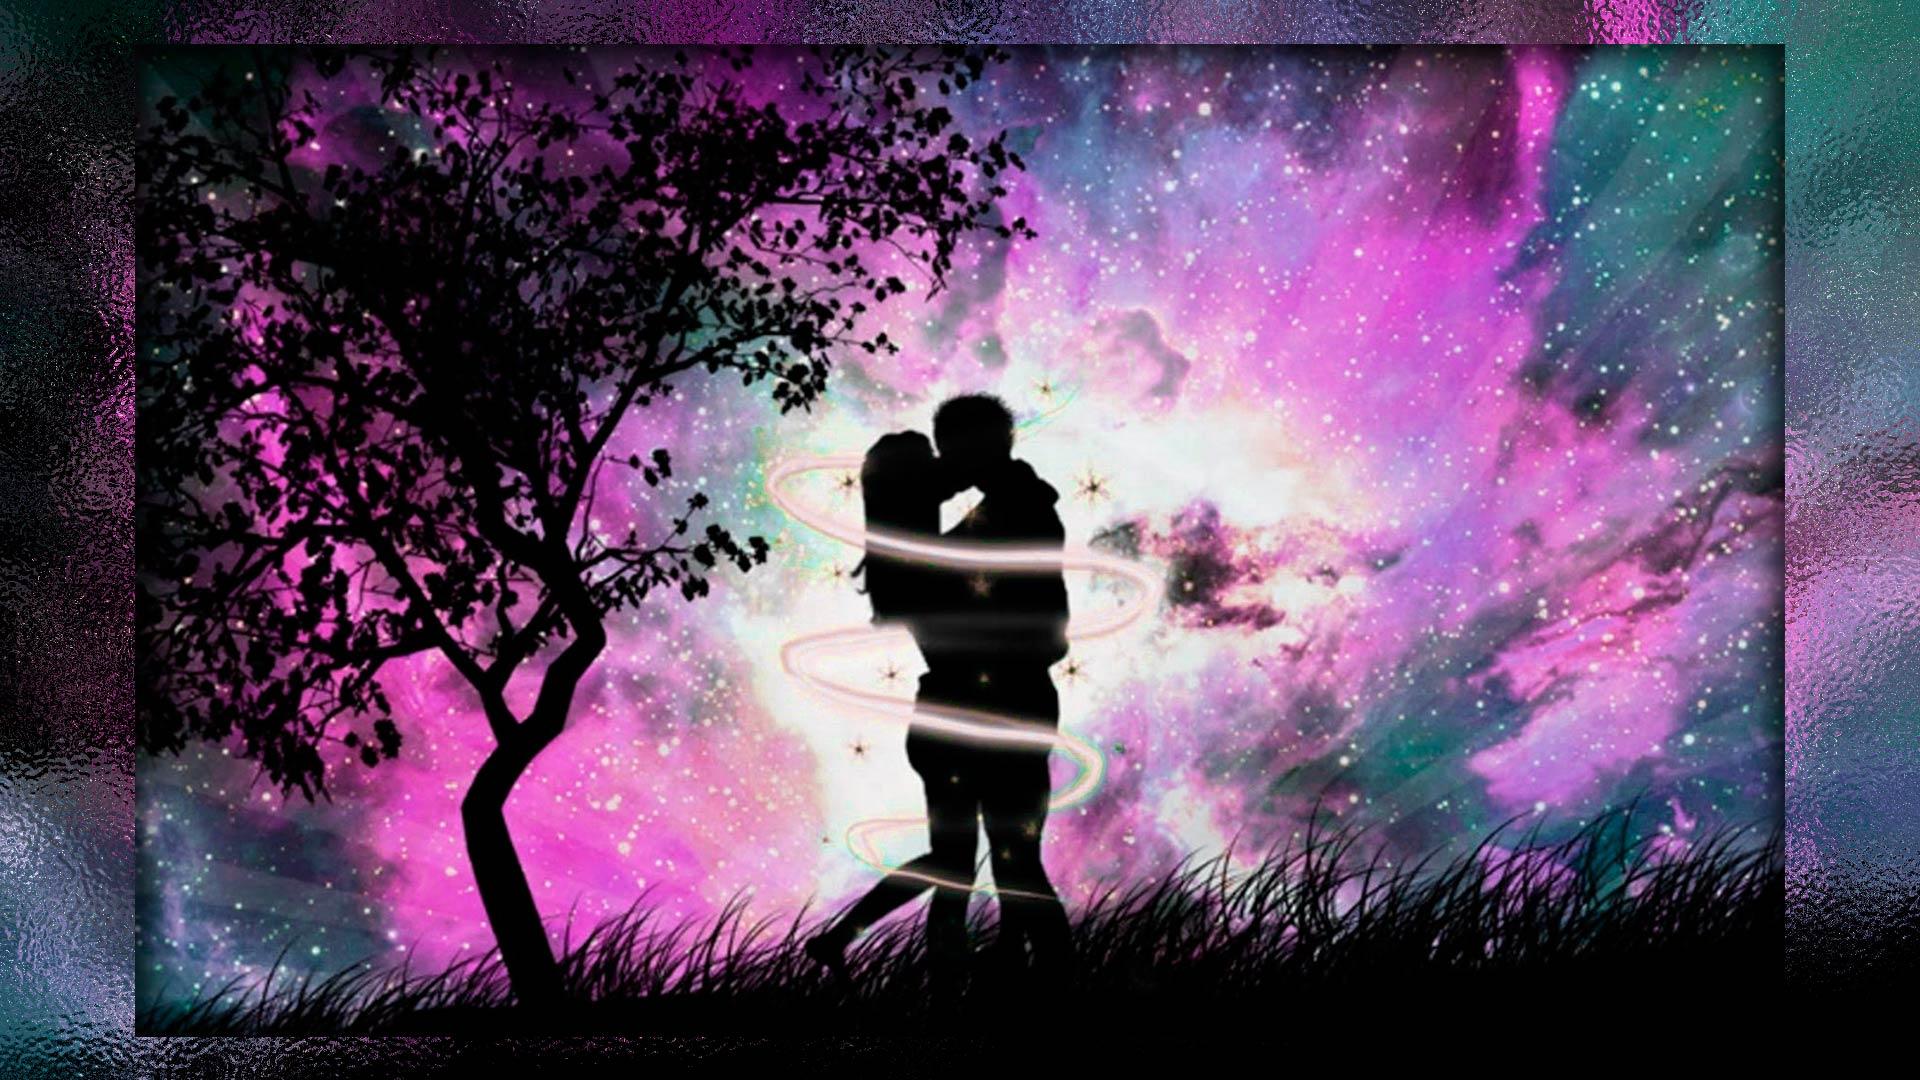 Lovers Image Wallpapers Wallpaper